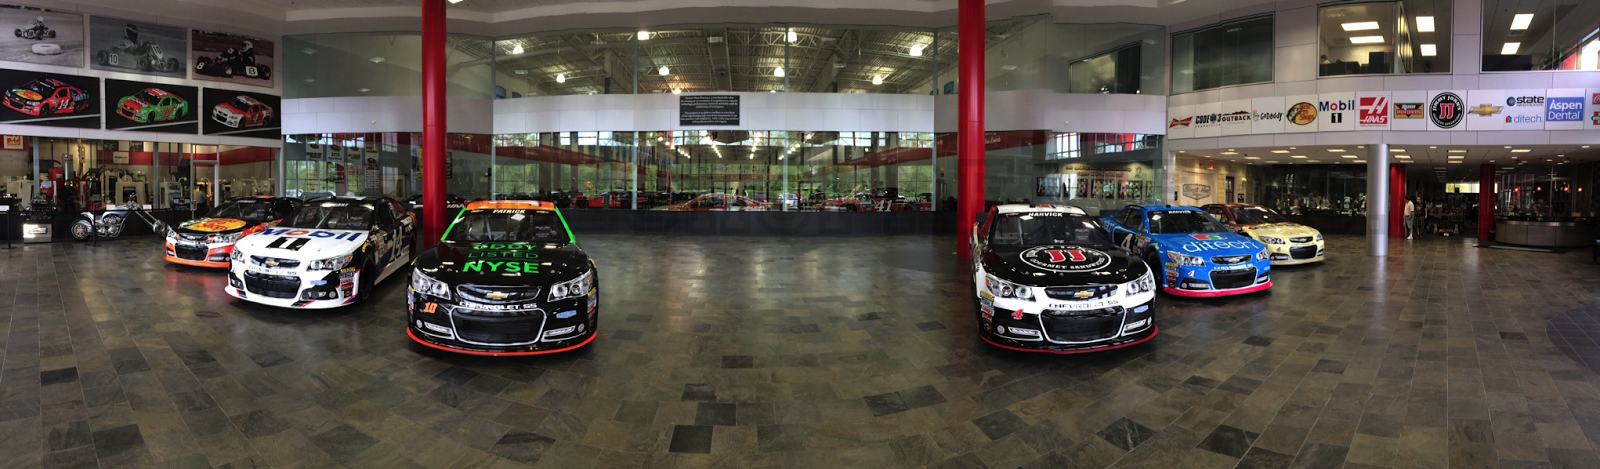 Shr Racing   Car